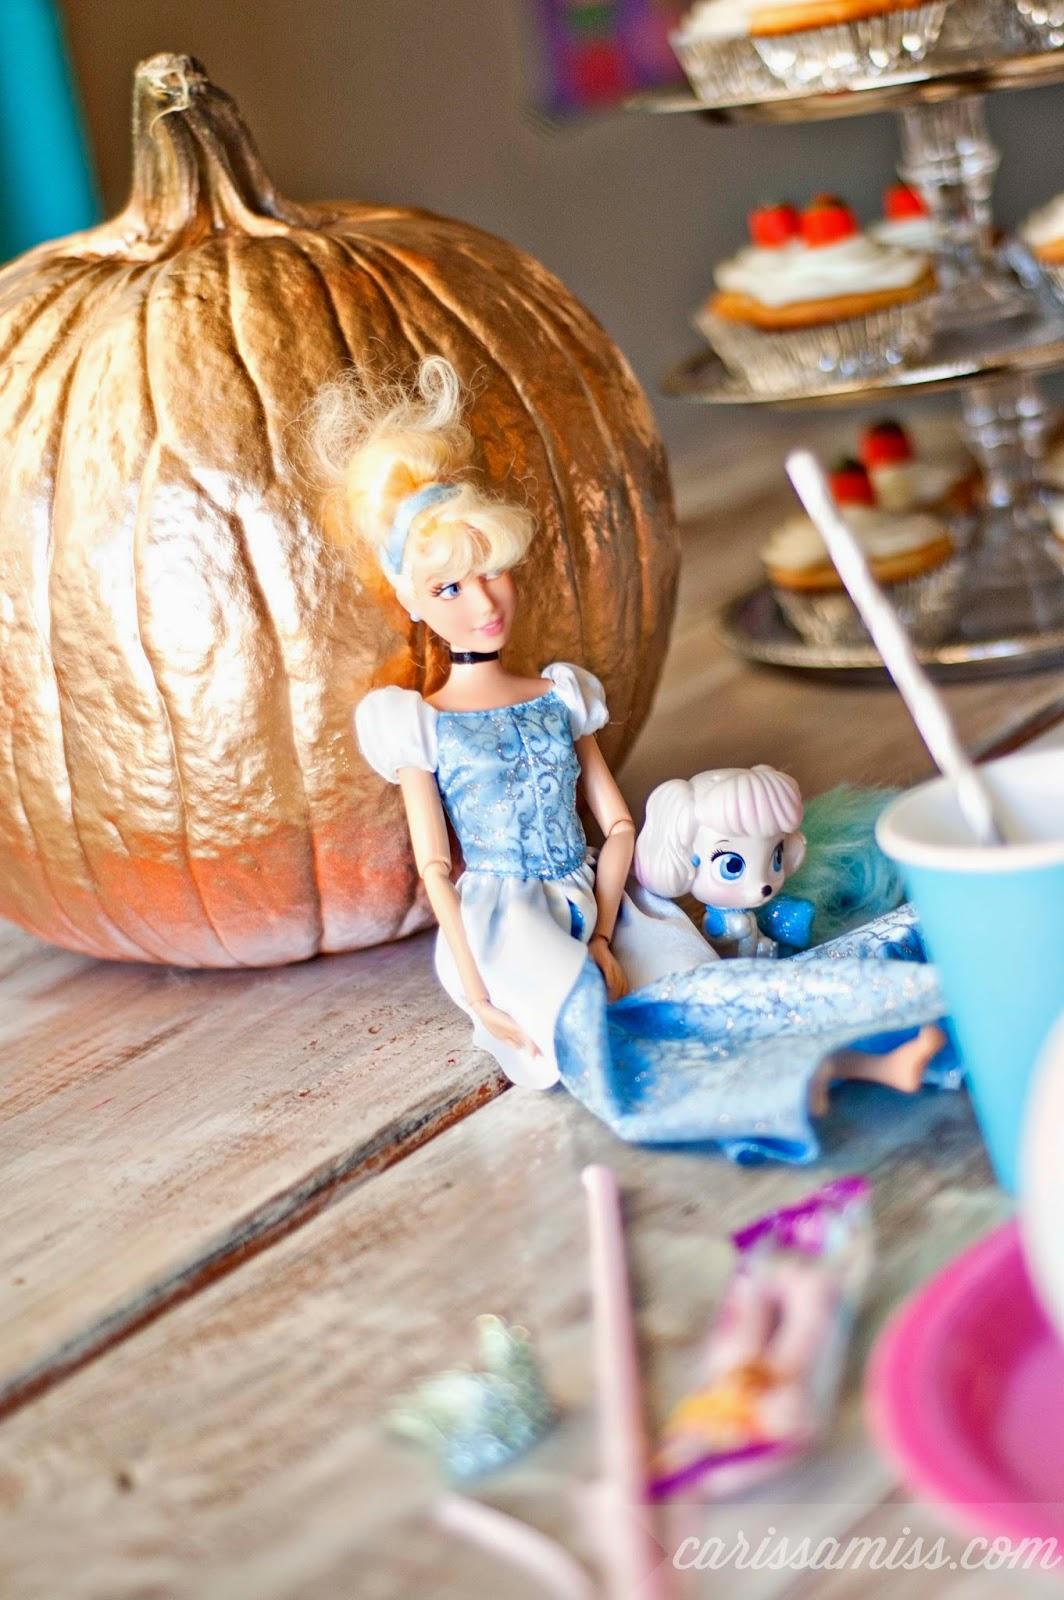 Carissa Miss: Simple Cinderella Party #DisneyBeauties #cbias #shop